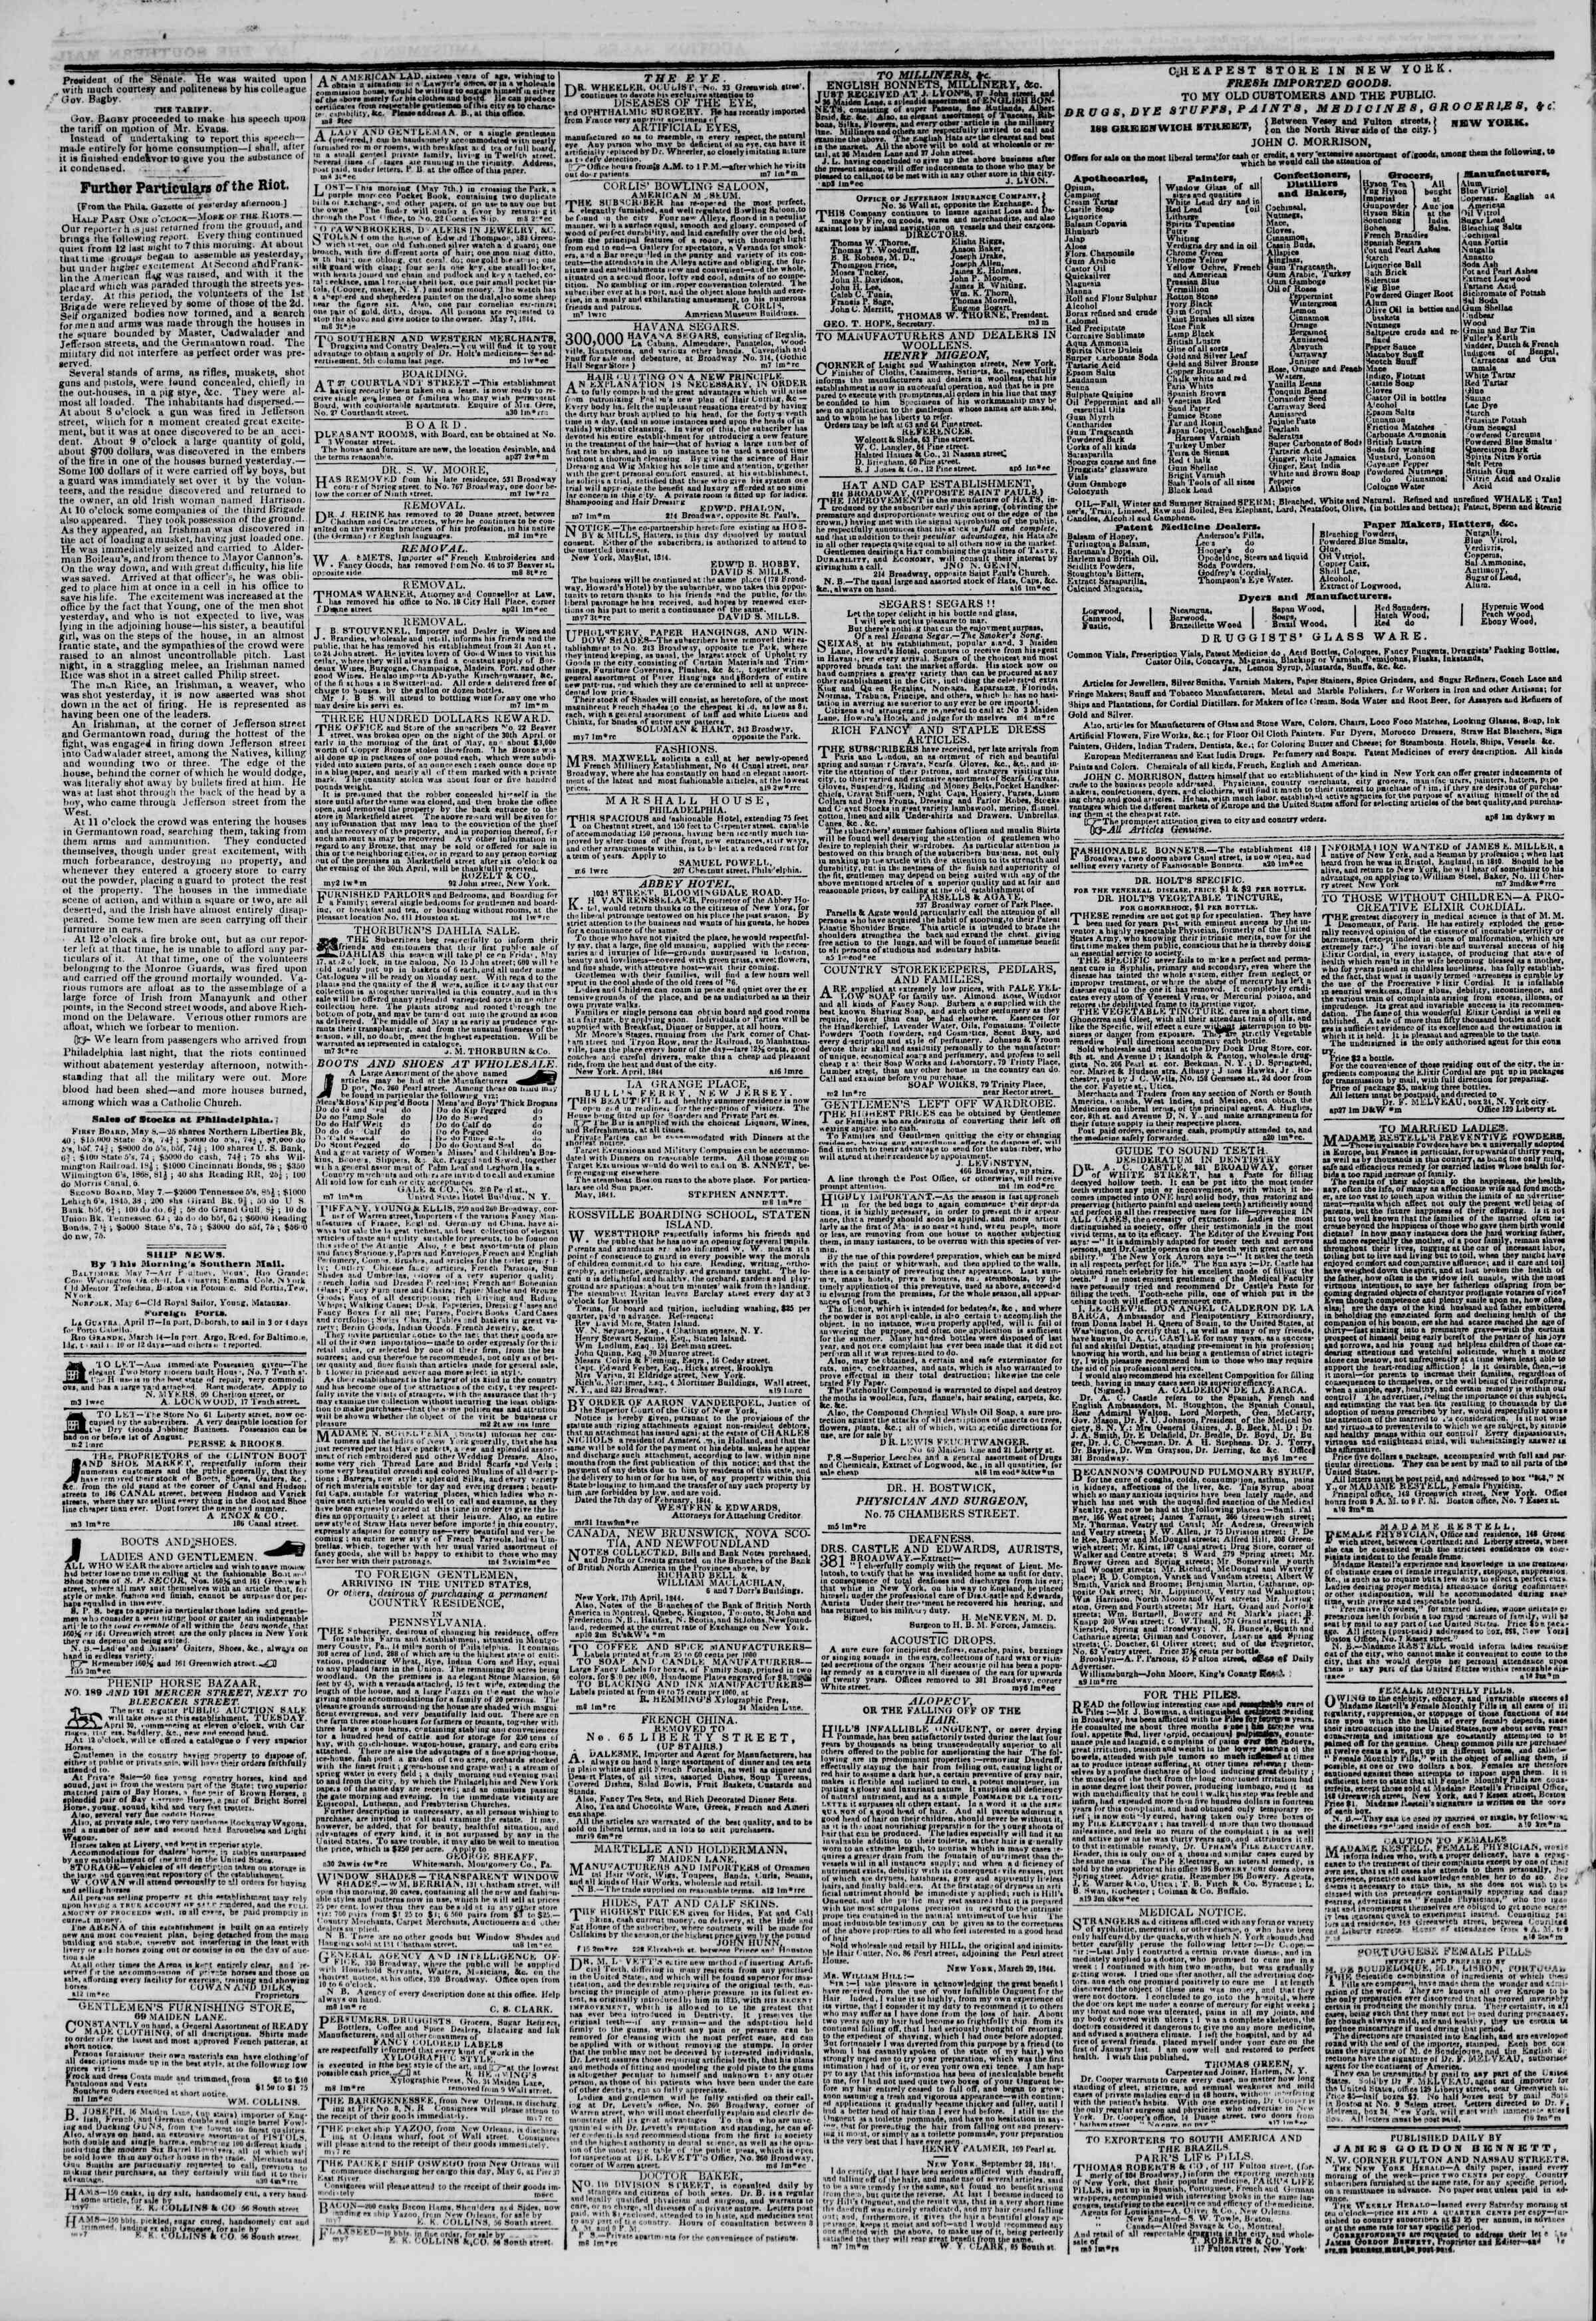 May 9, 1844 Tarihli The New York Herald Gazetesi Sayfa 4